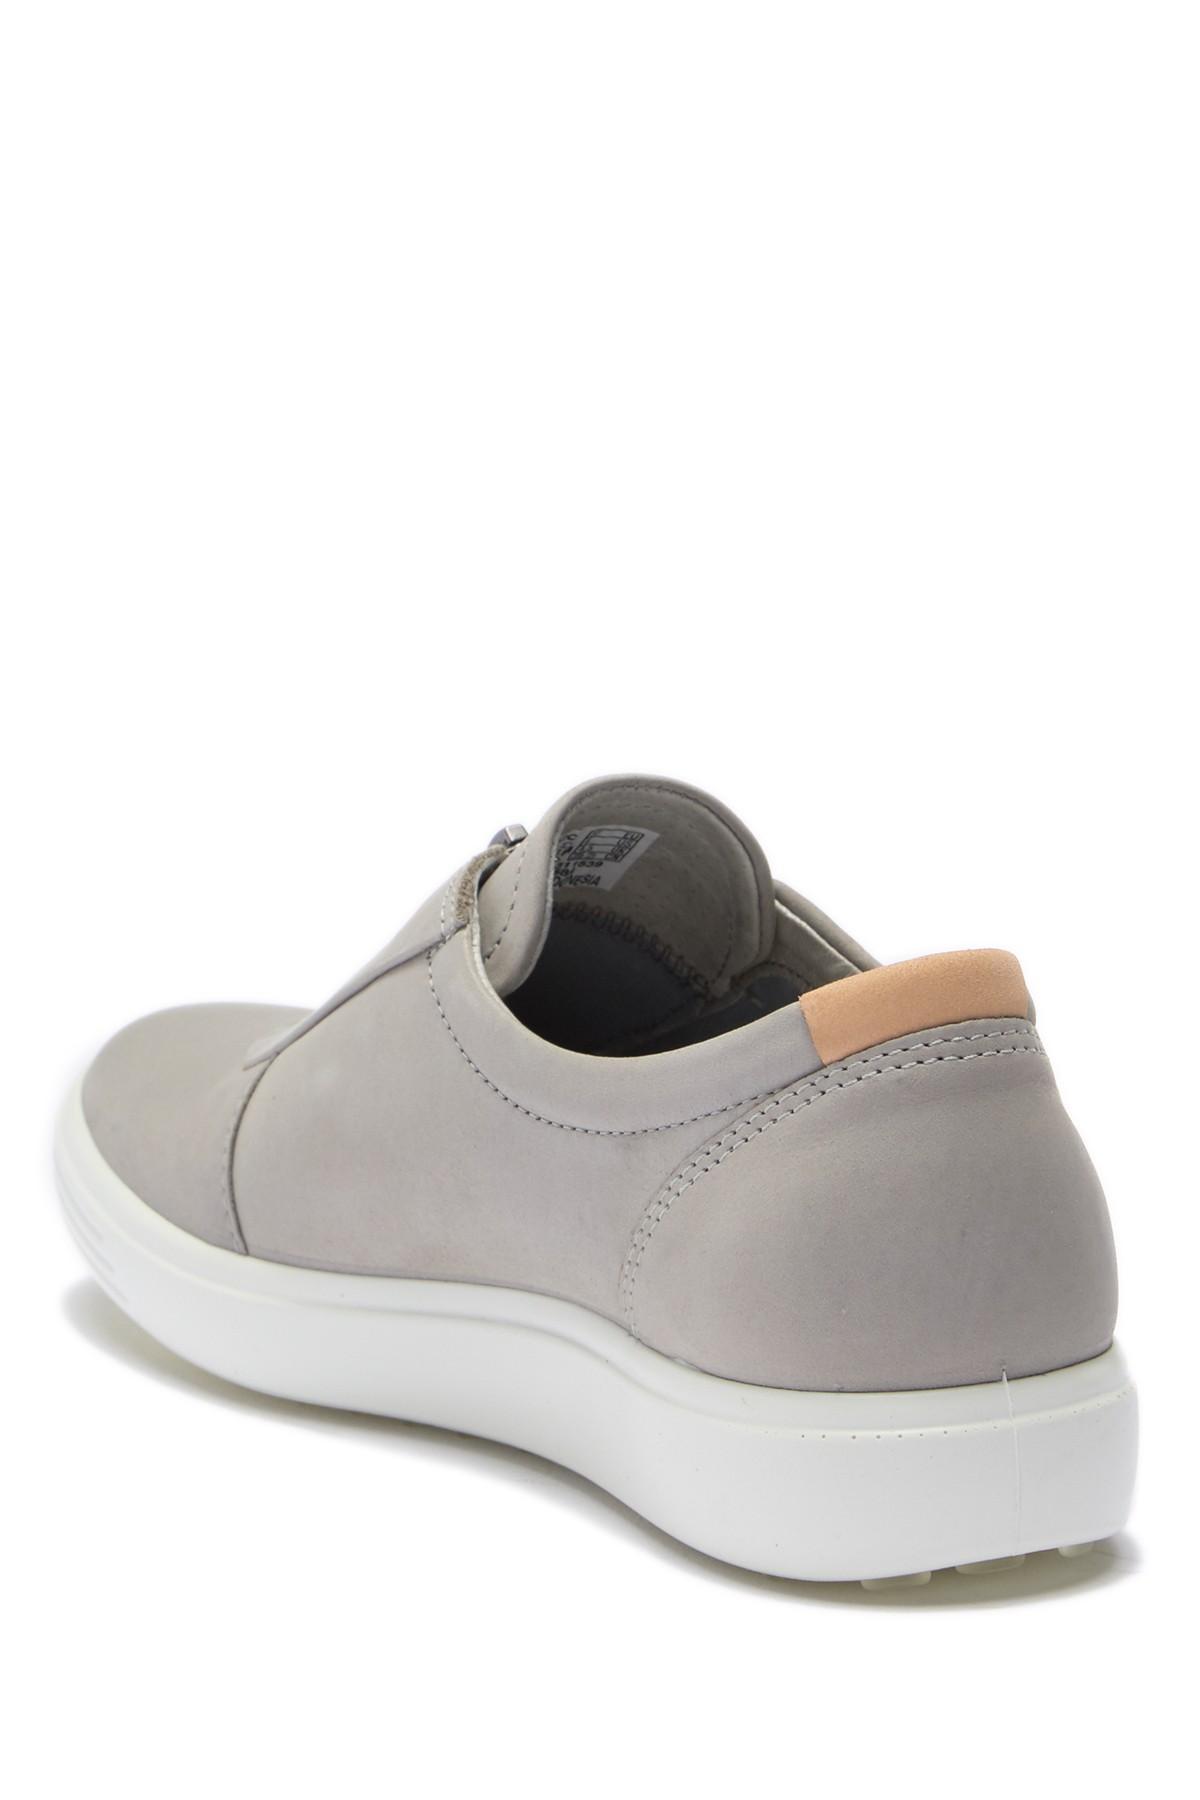 Ecco Soft 7 Leather Zip Sneaker - Lyst